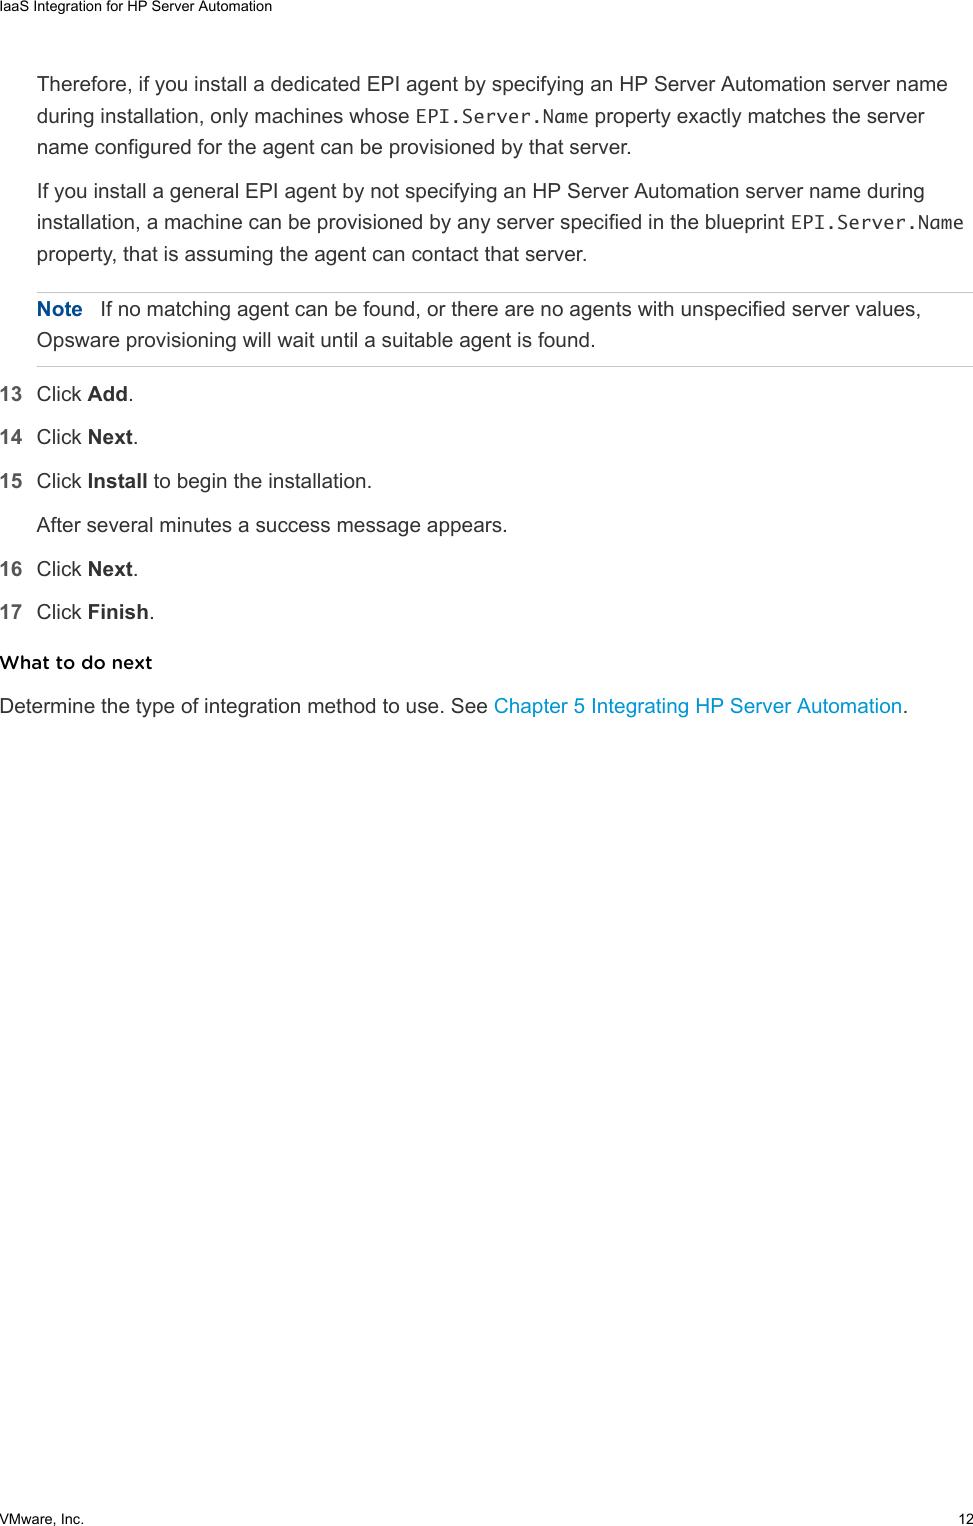 IaaS Integration For HP Server Automation VRealize  7 3 V